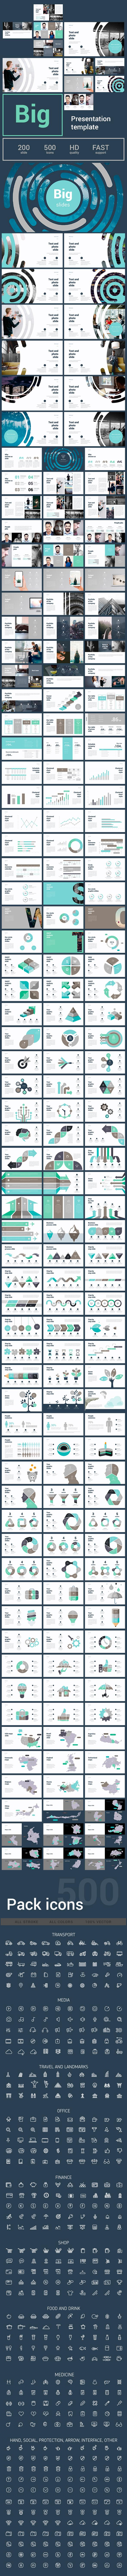 Big Slides Clean Powerpoint - Business PowerPoint Templates